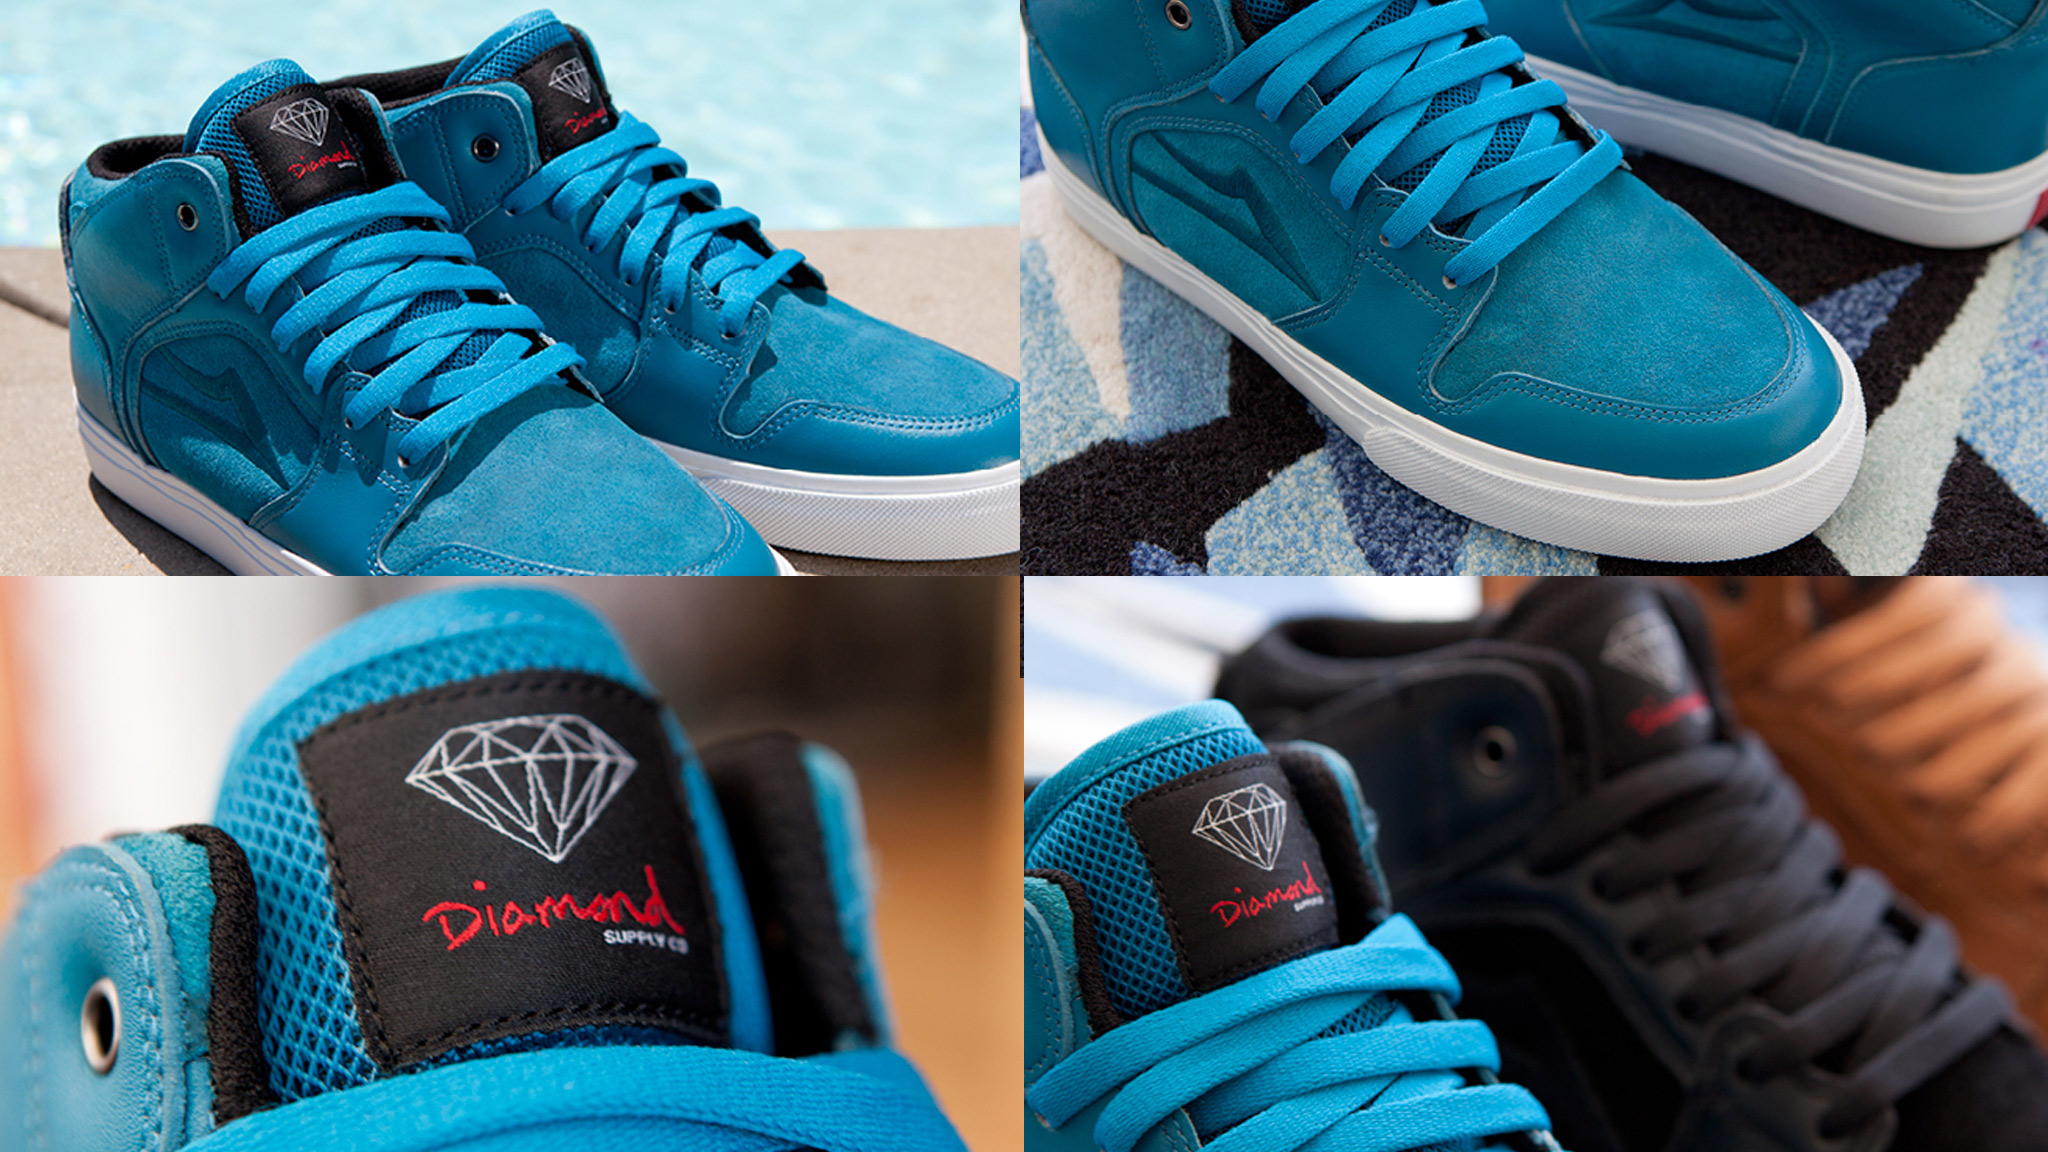 Lakai x Diamond Supply Co Lakai x Diamond Supply Co